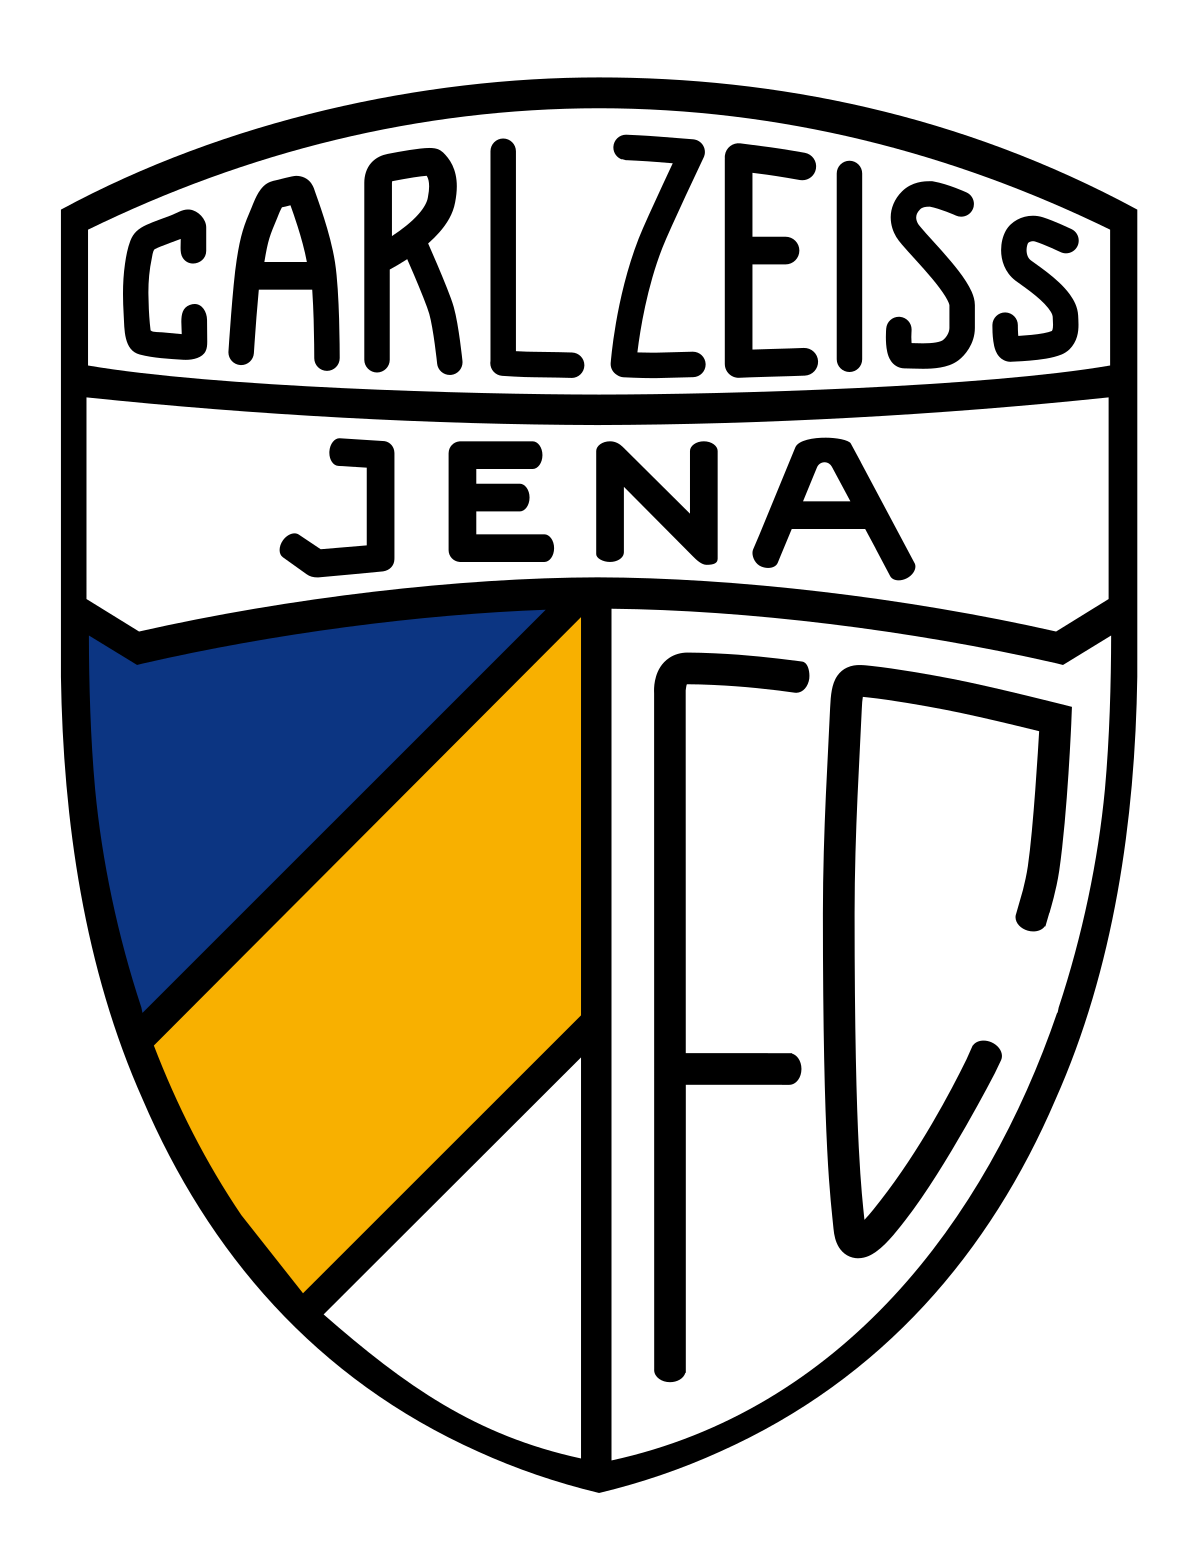 Logotipo da equipe Carl Zeiss Jena